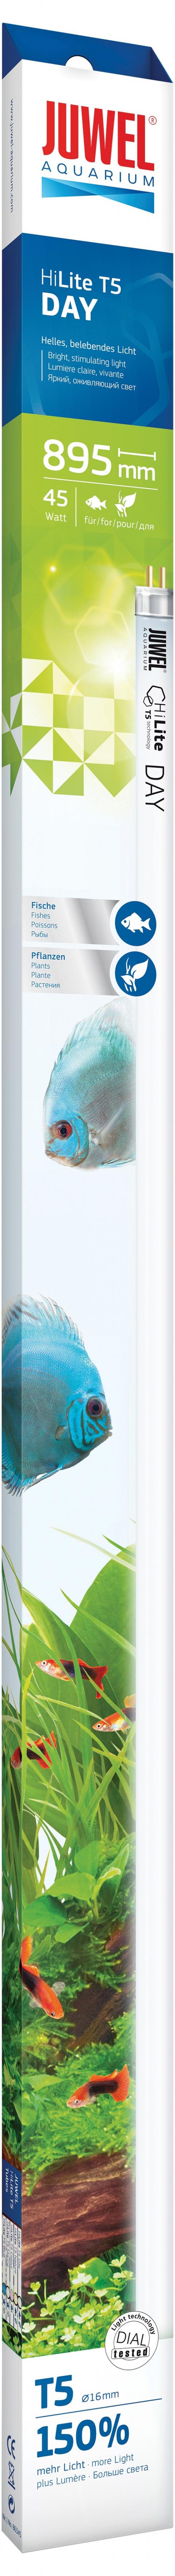 Lampa akvārijam - High-Lite Day T5 45W 895 mm, dienas apgaismojums title=